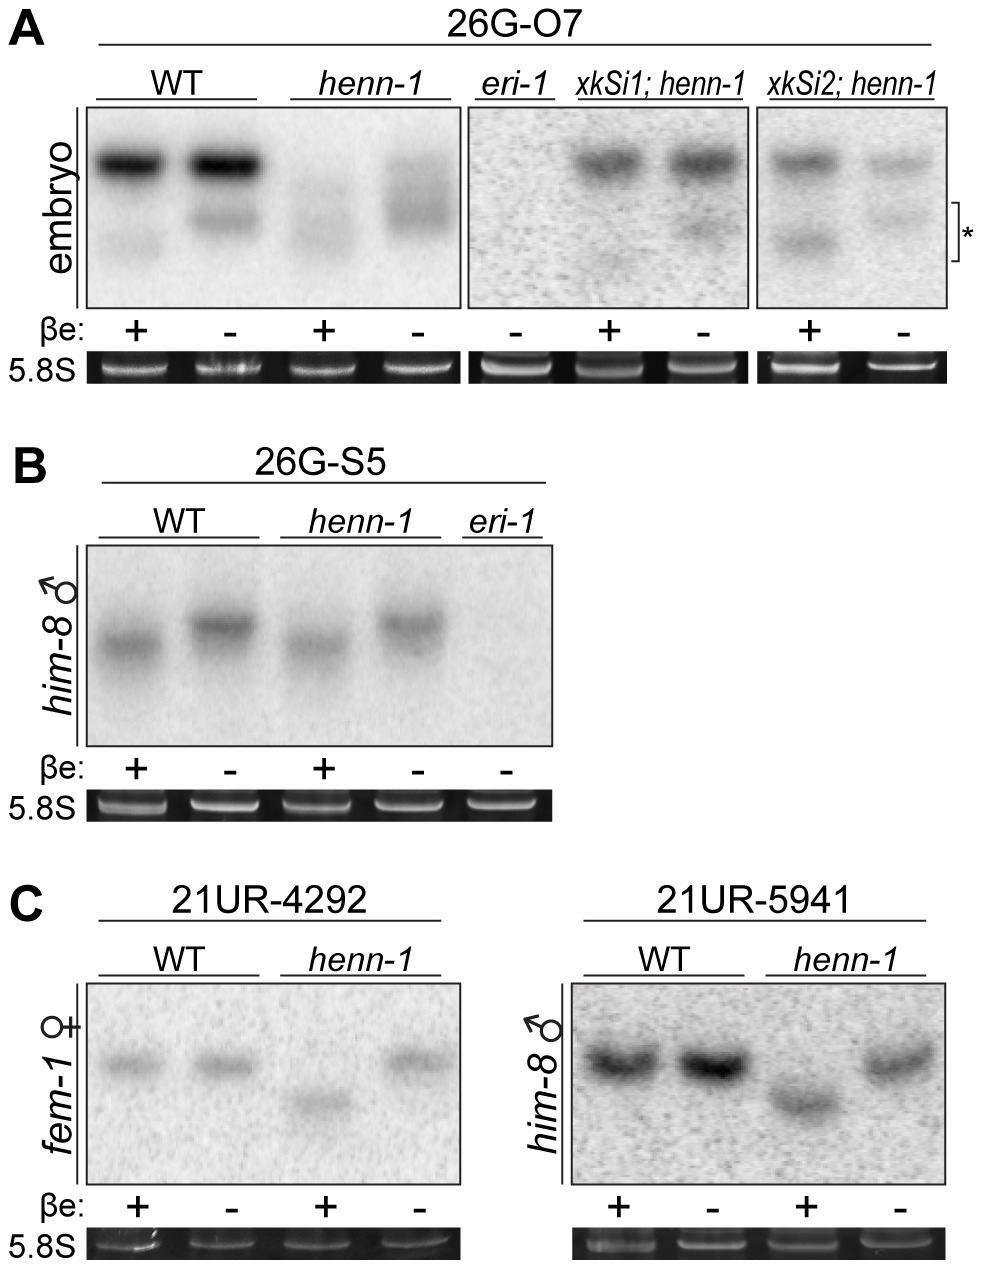 HENN-1 Selectively Methylates ERGO-1 Class 26G RNAs in an ERGO-1–Dependent Manner.